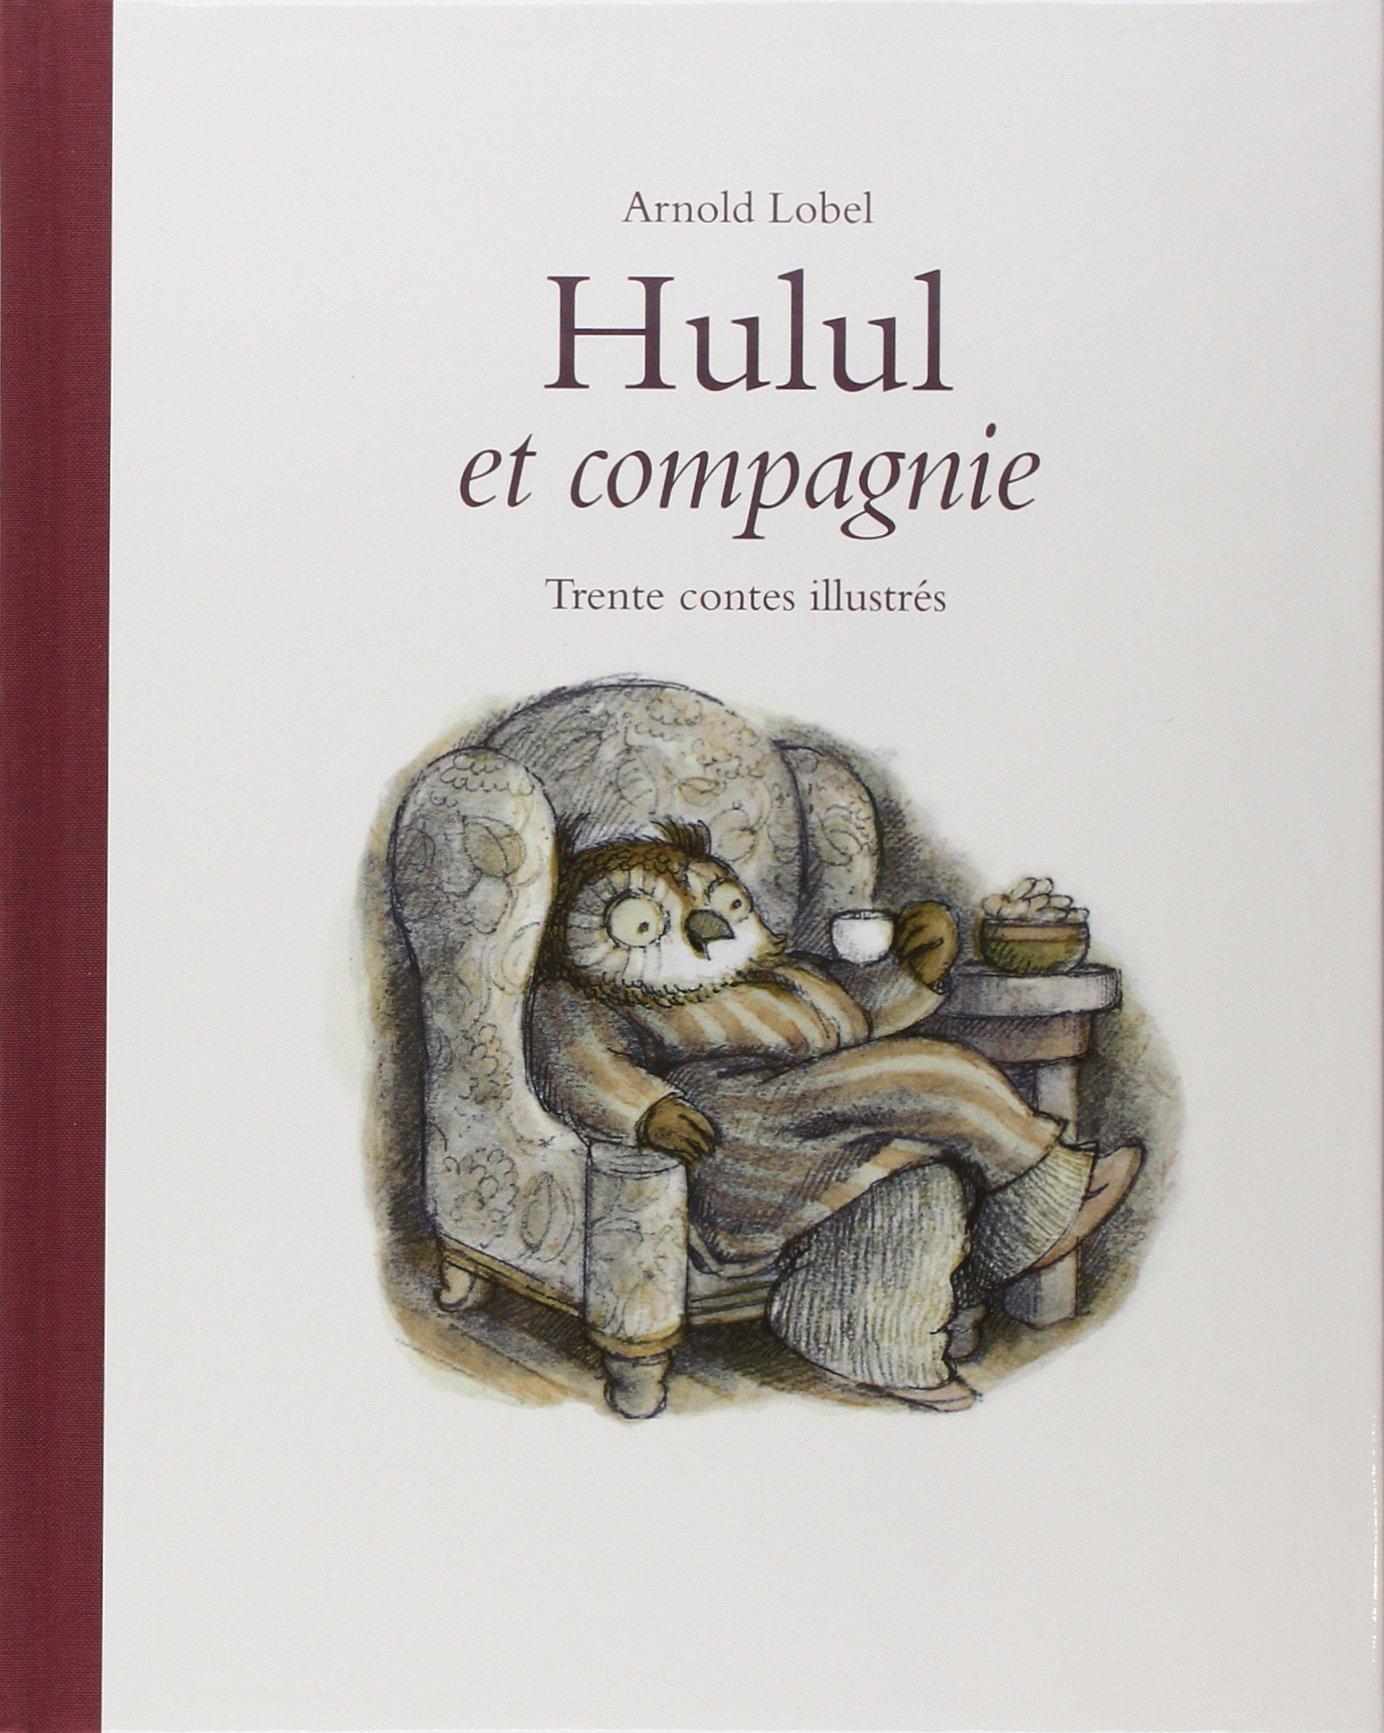 HULUL ET COMPAGNIE : TRENTE CONTES ILLUSTRÉS: Amazon.ca: LOBEL,ARNOLD: Books